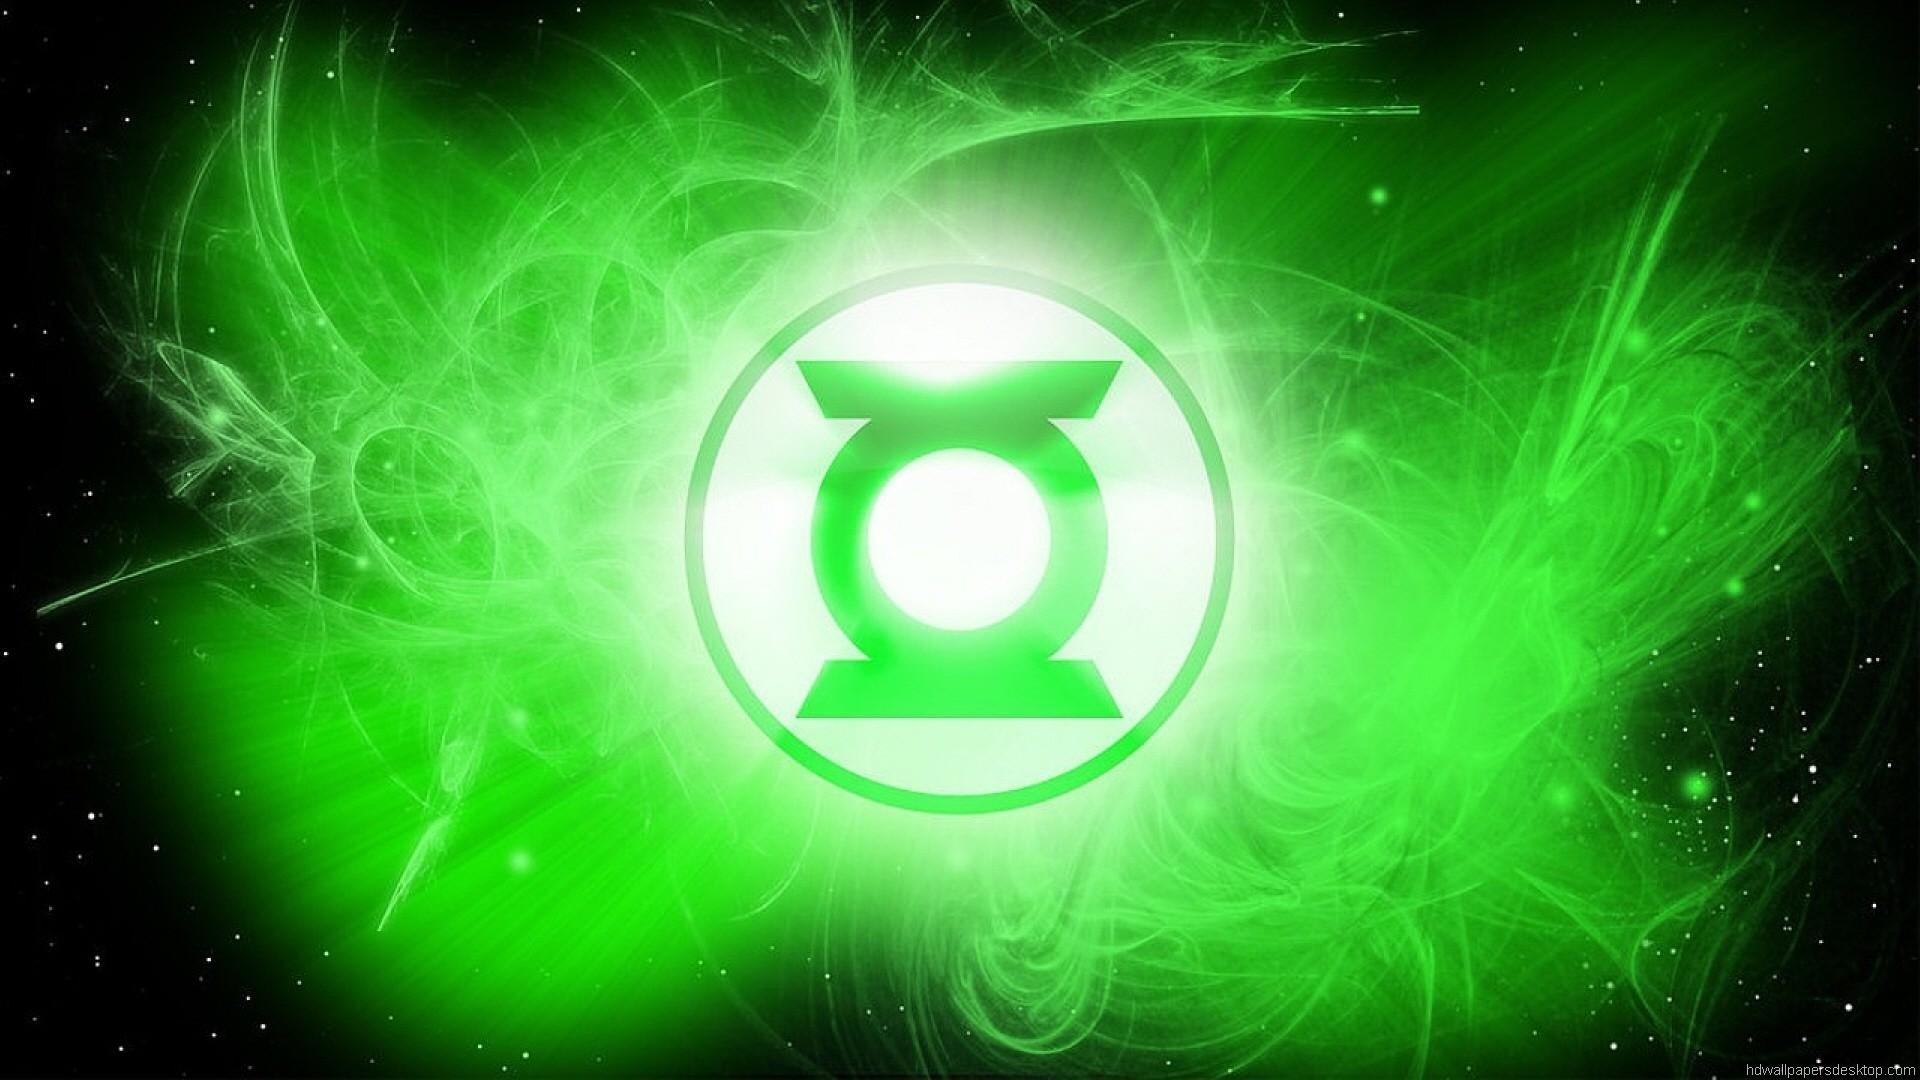 Cool Lantern Wallpaper